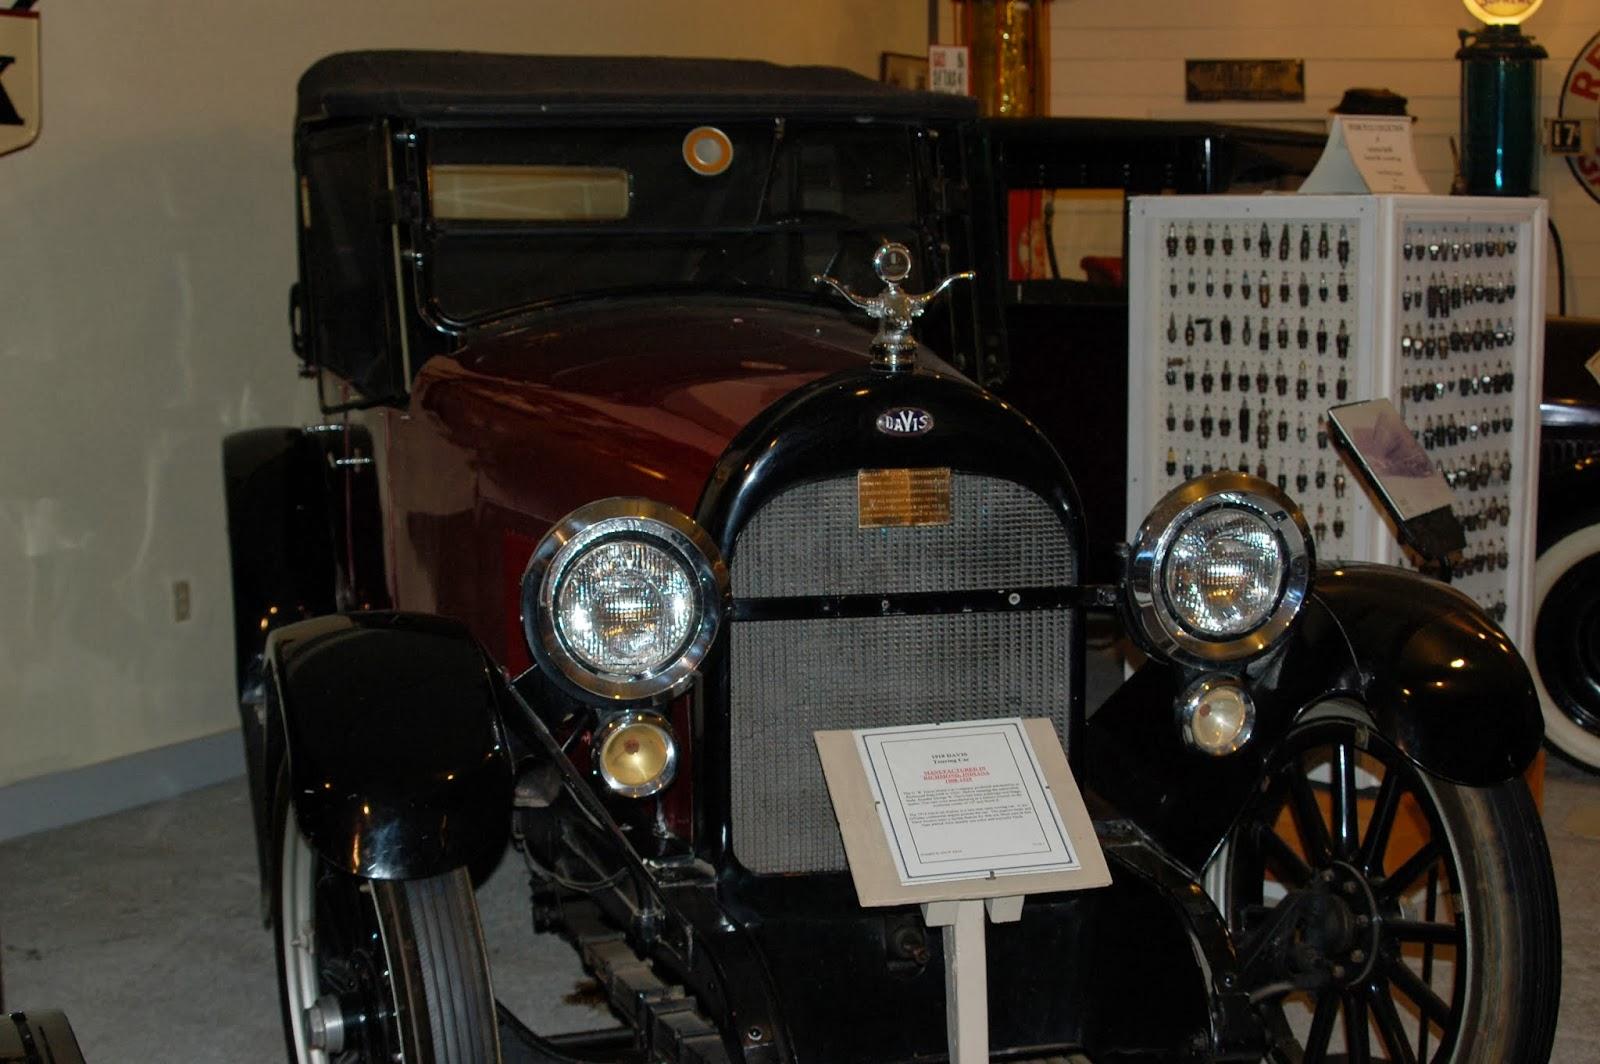 Turnerbudds Car Blog: One More From Wayne County